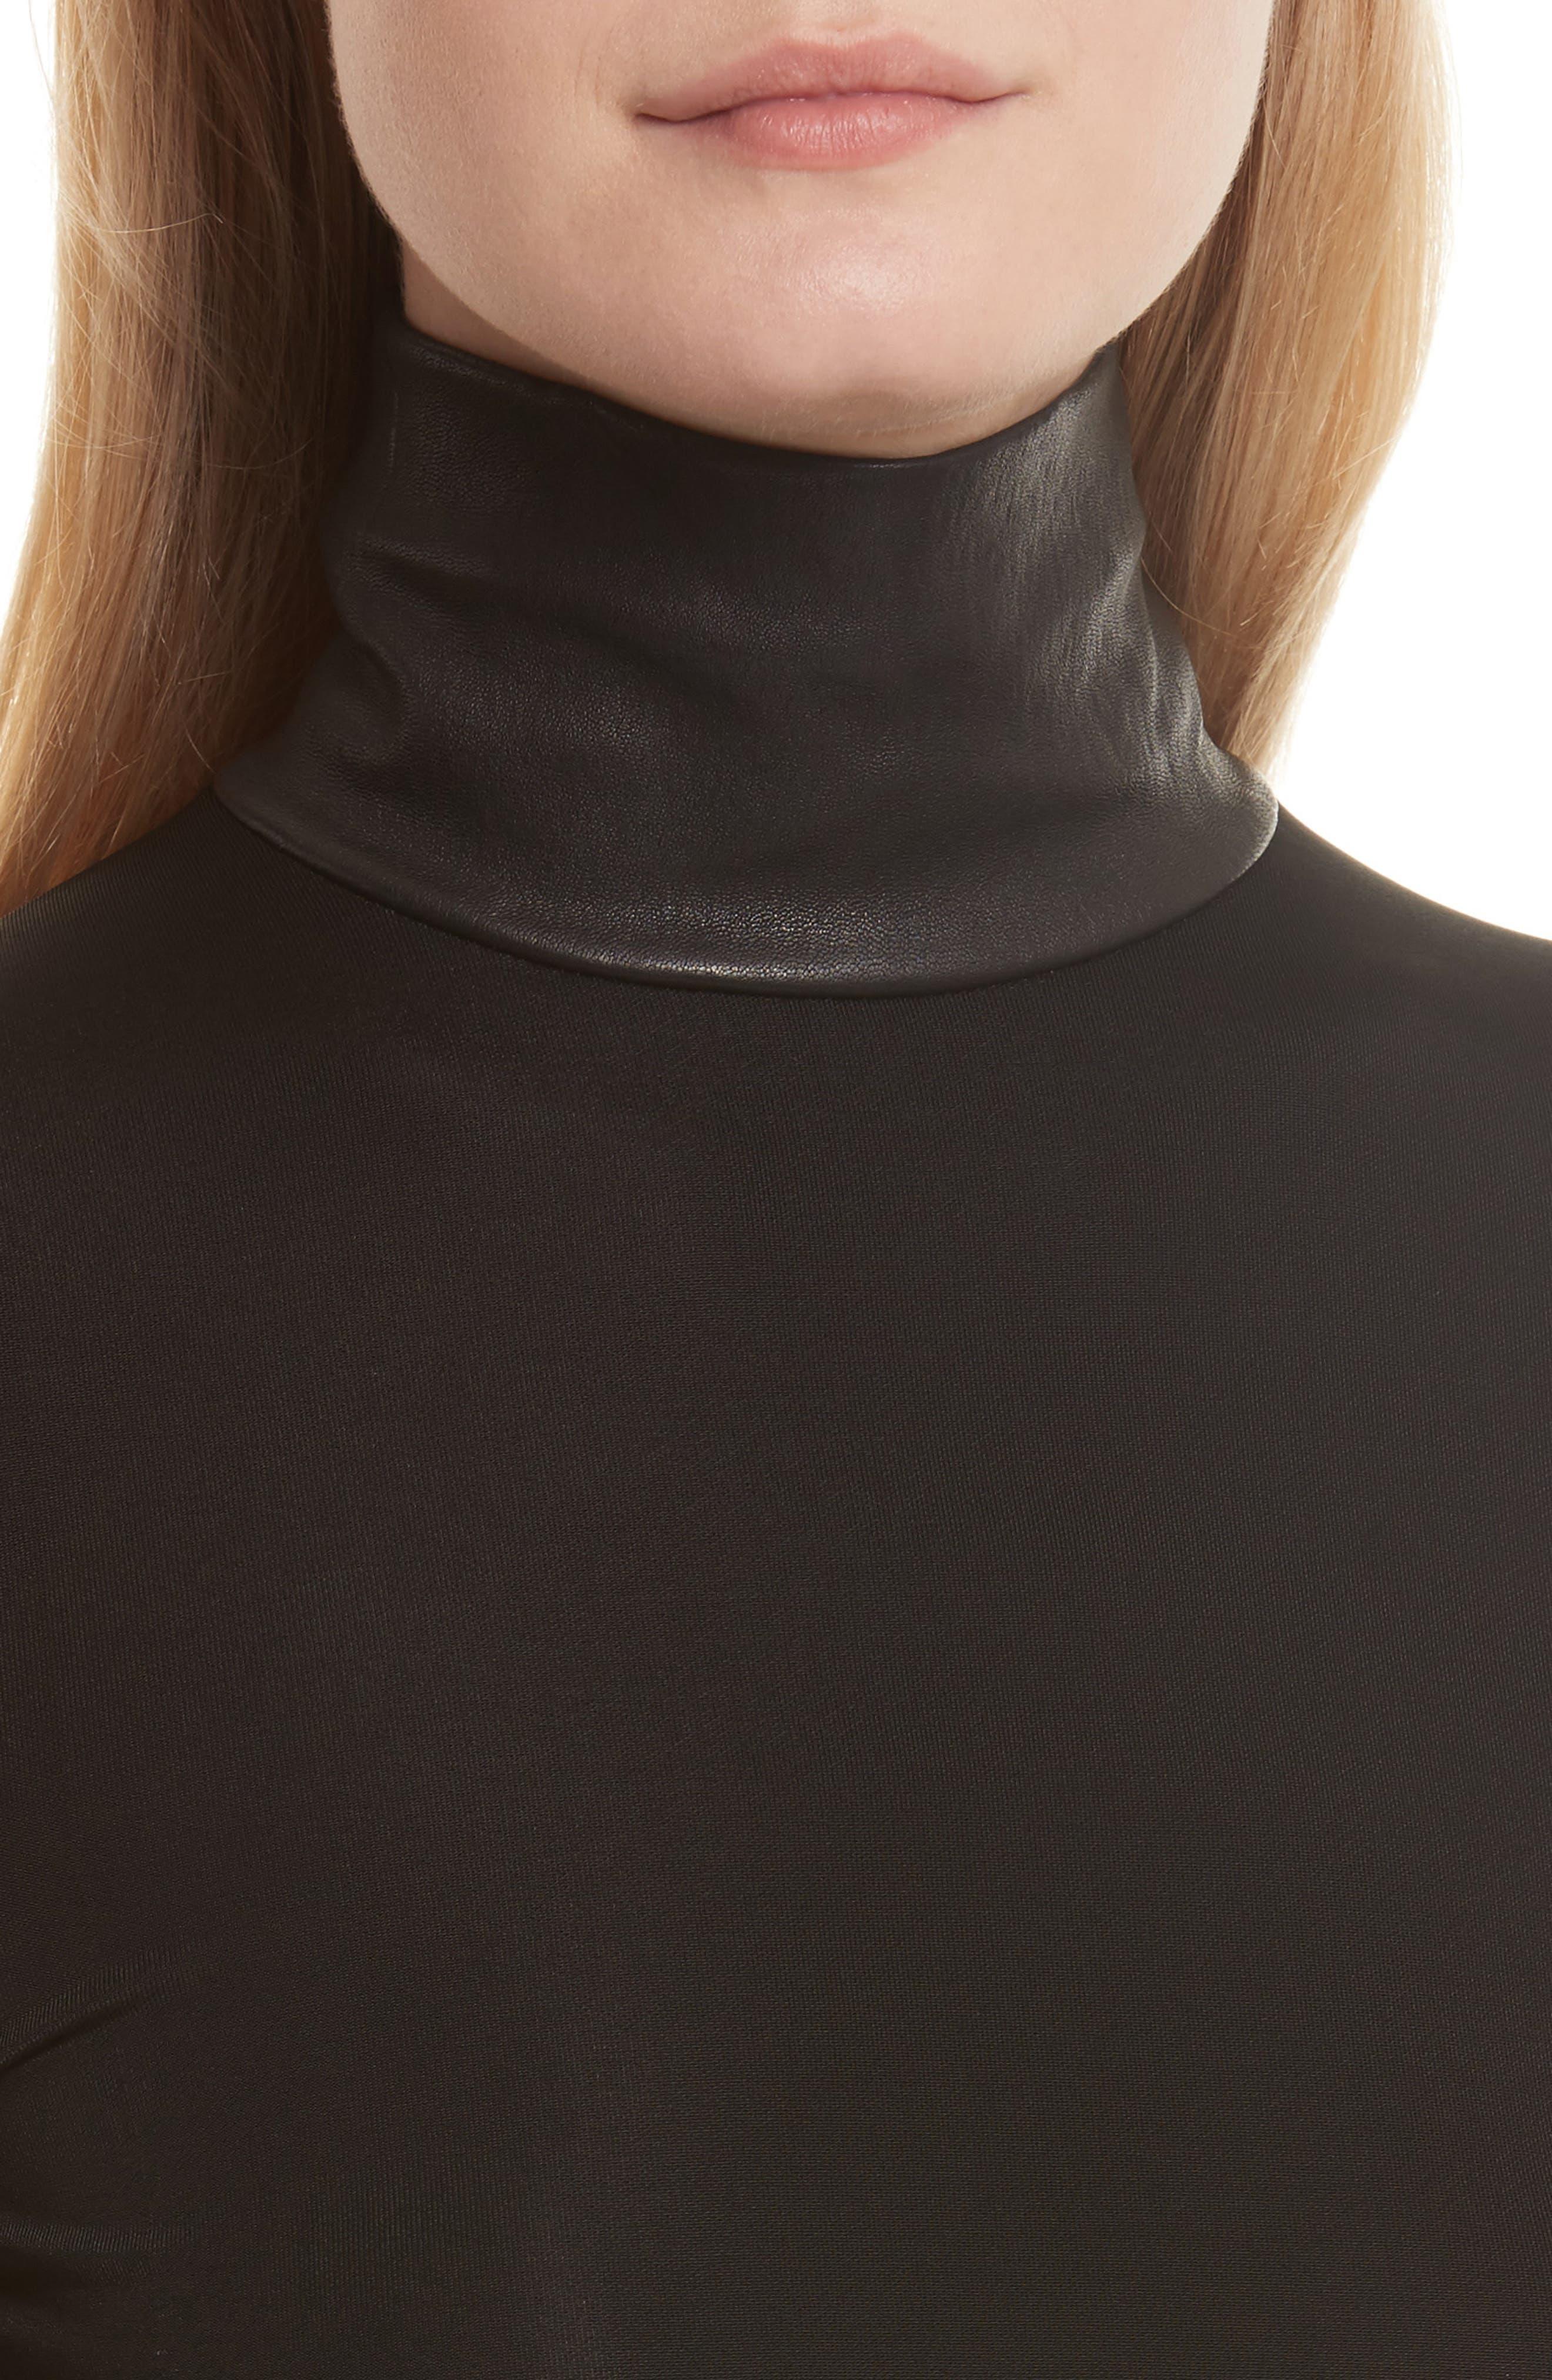 Bondage Jersey Leather Neck Top,                             Alternate thumbnail 4, color,                             001